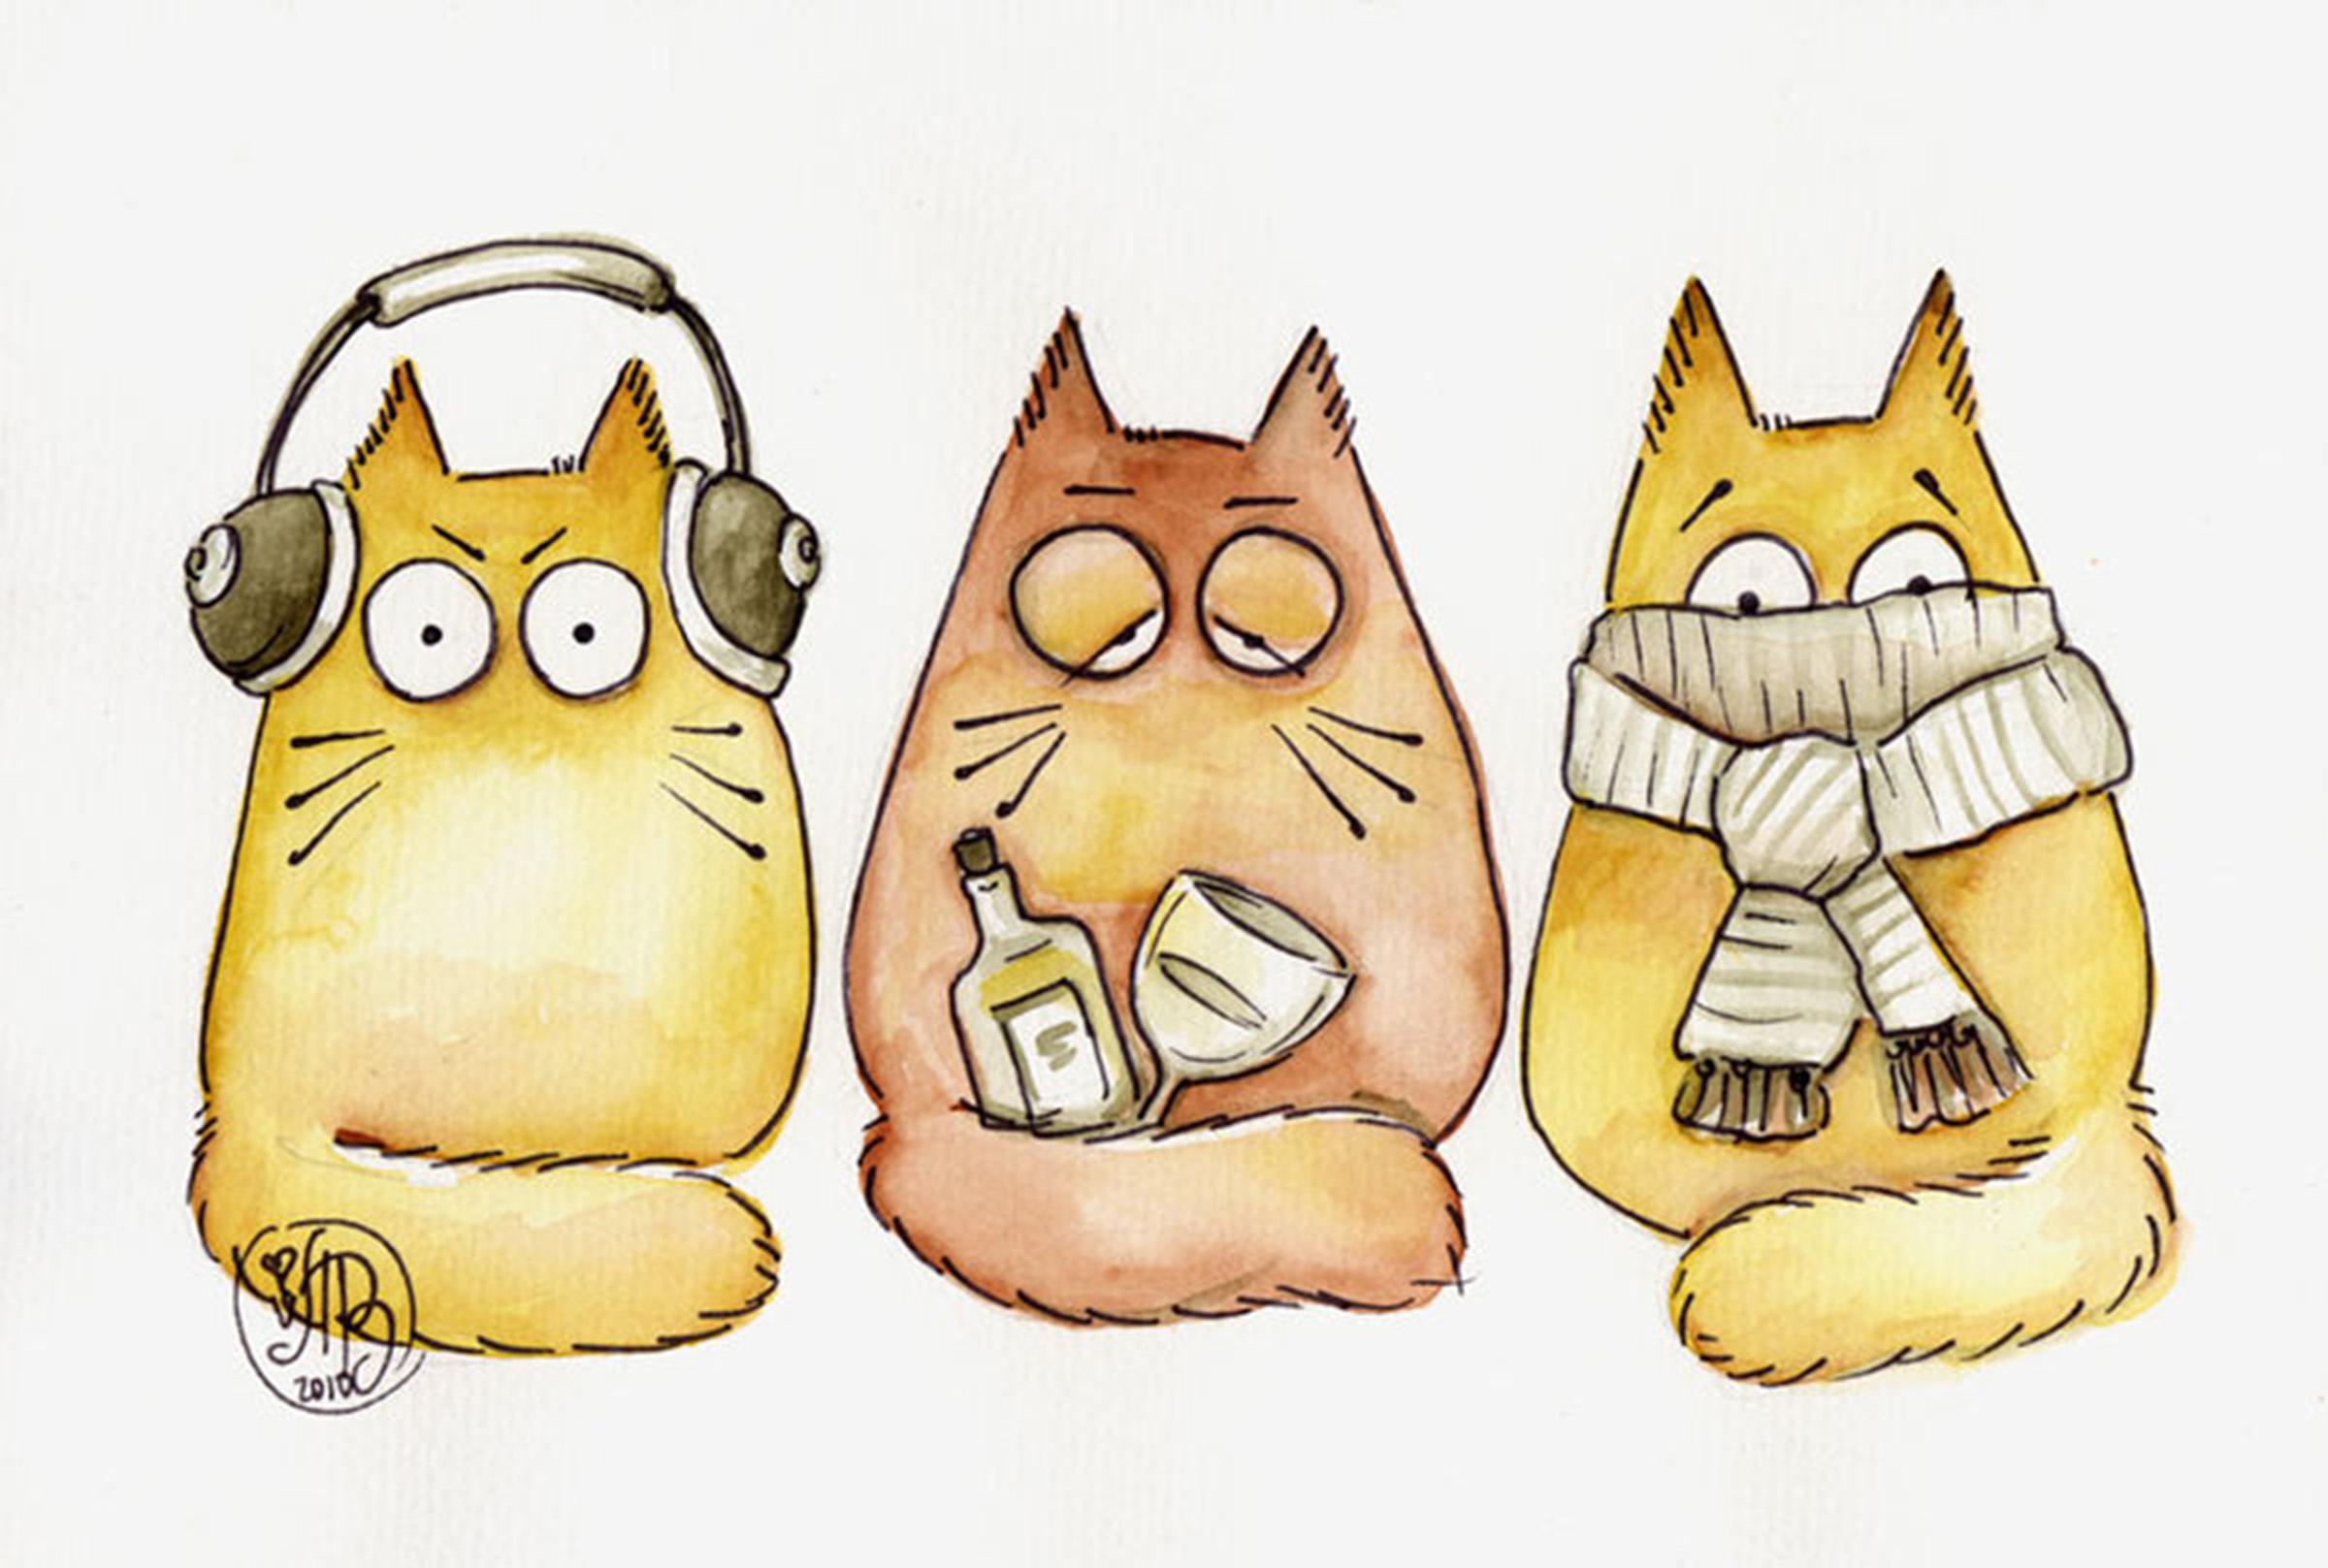 http://www.pookies-world.com/wp-content/uploads/2013/02/cat_a_strophe_by_maria_van_bruggen-d2inanv.jpg